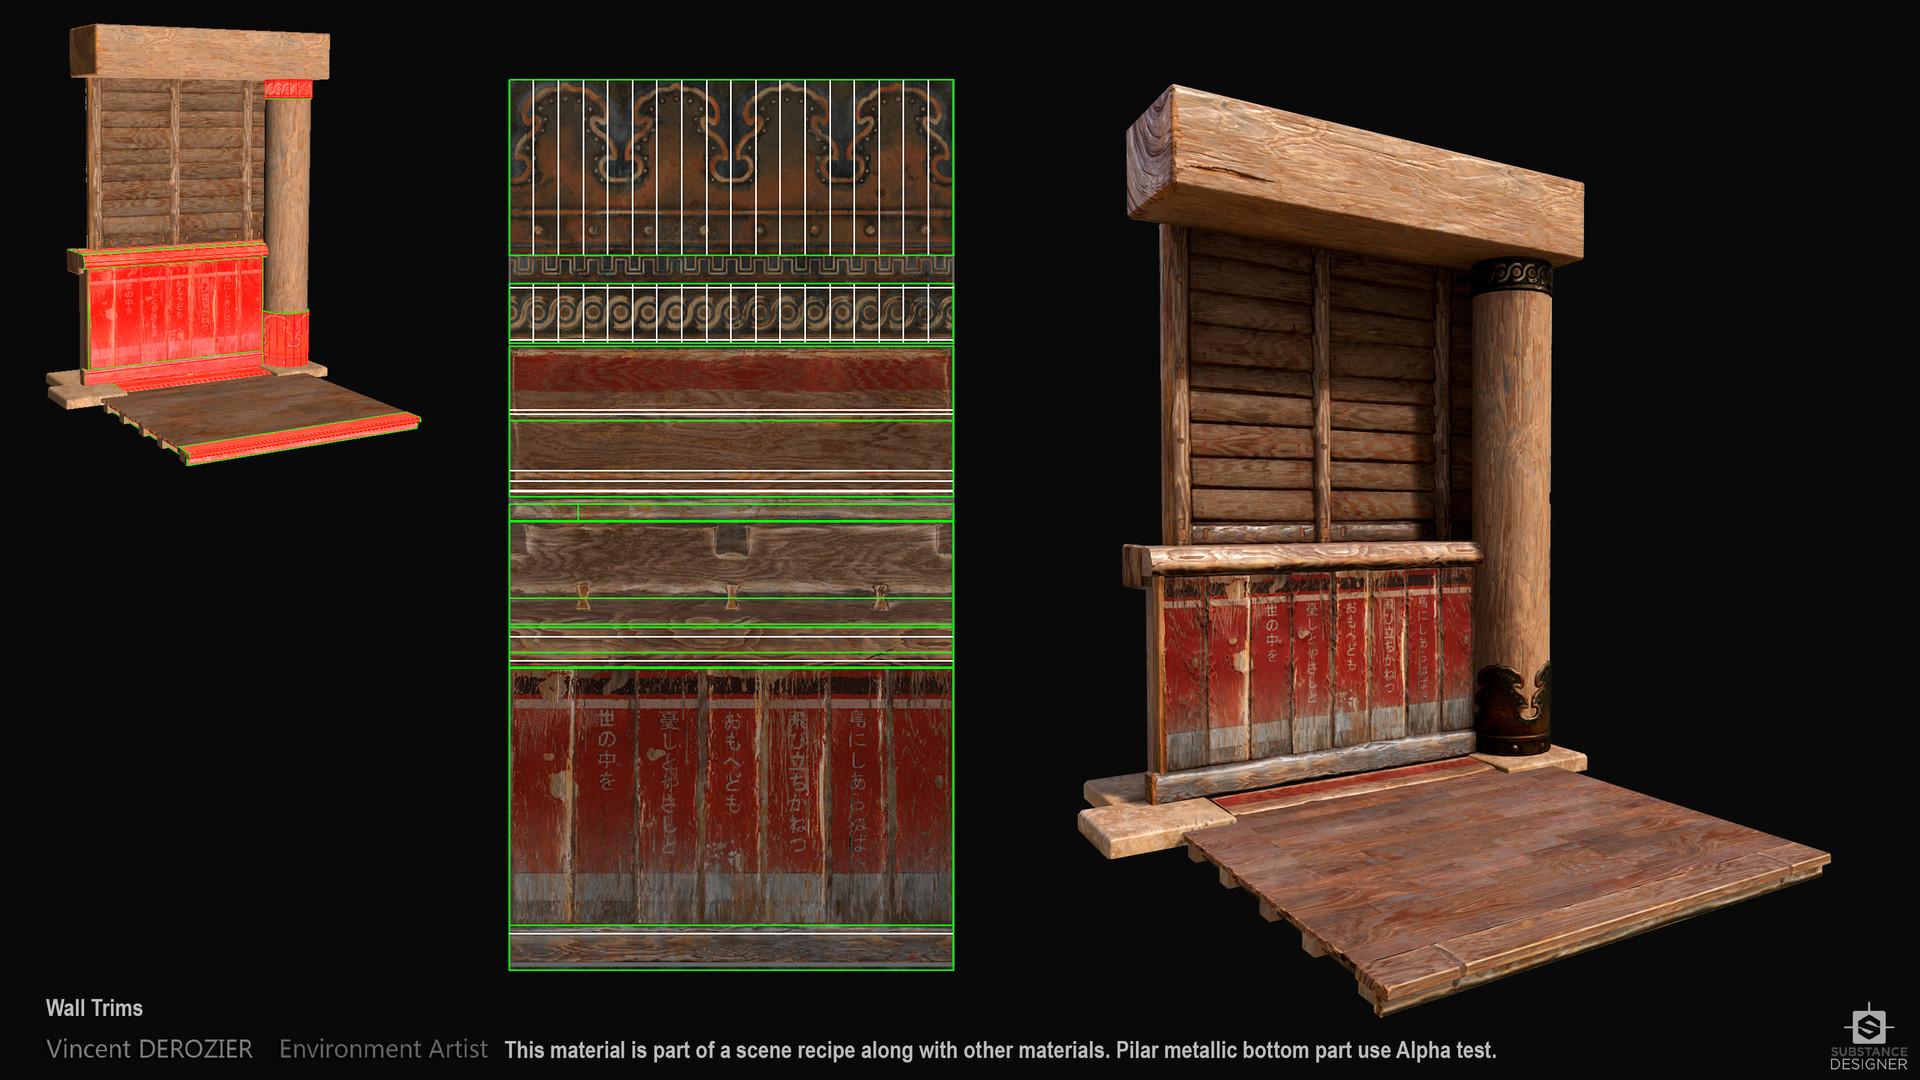 Vincent derozier woodwall2 render5